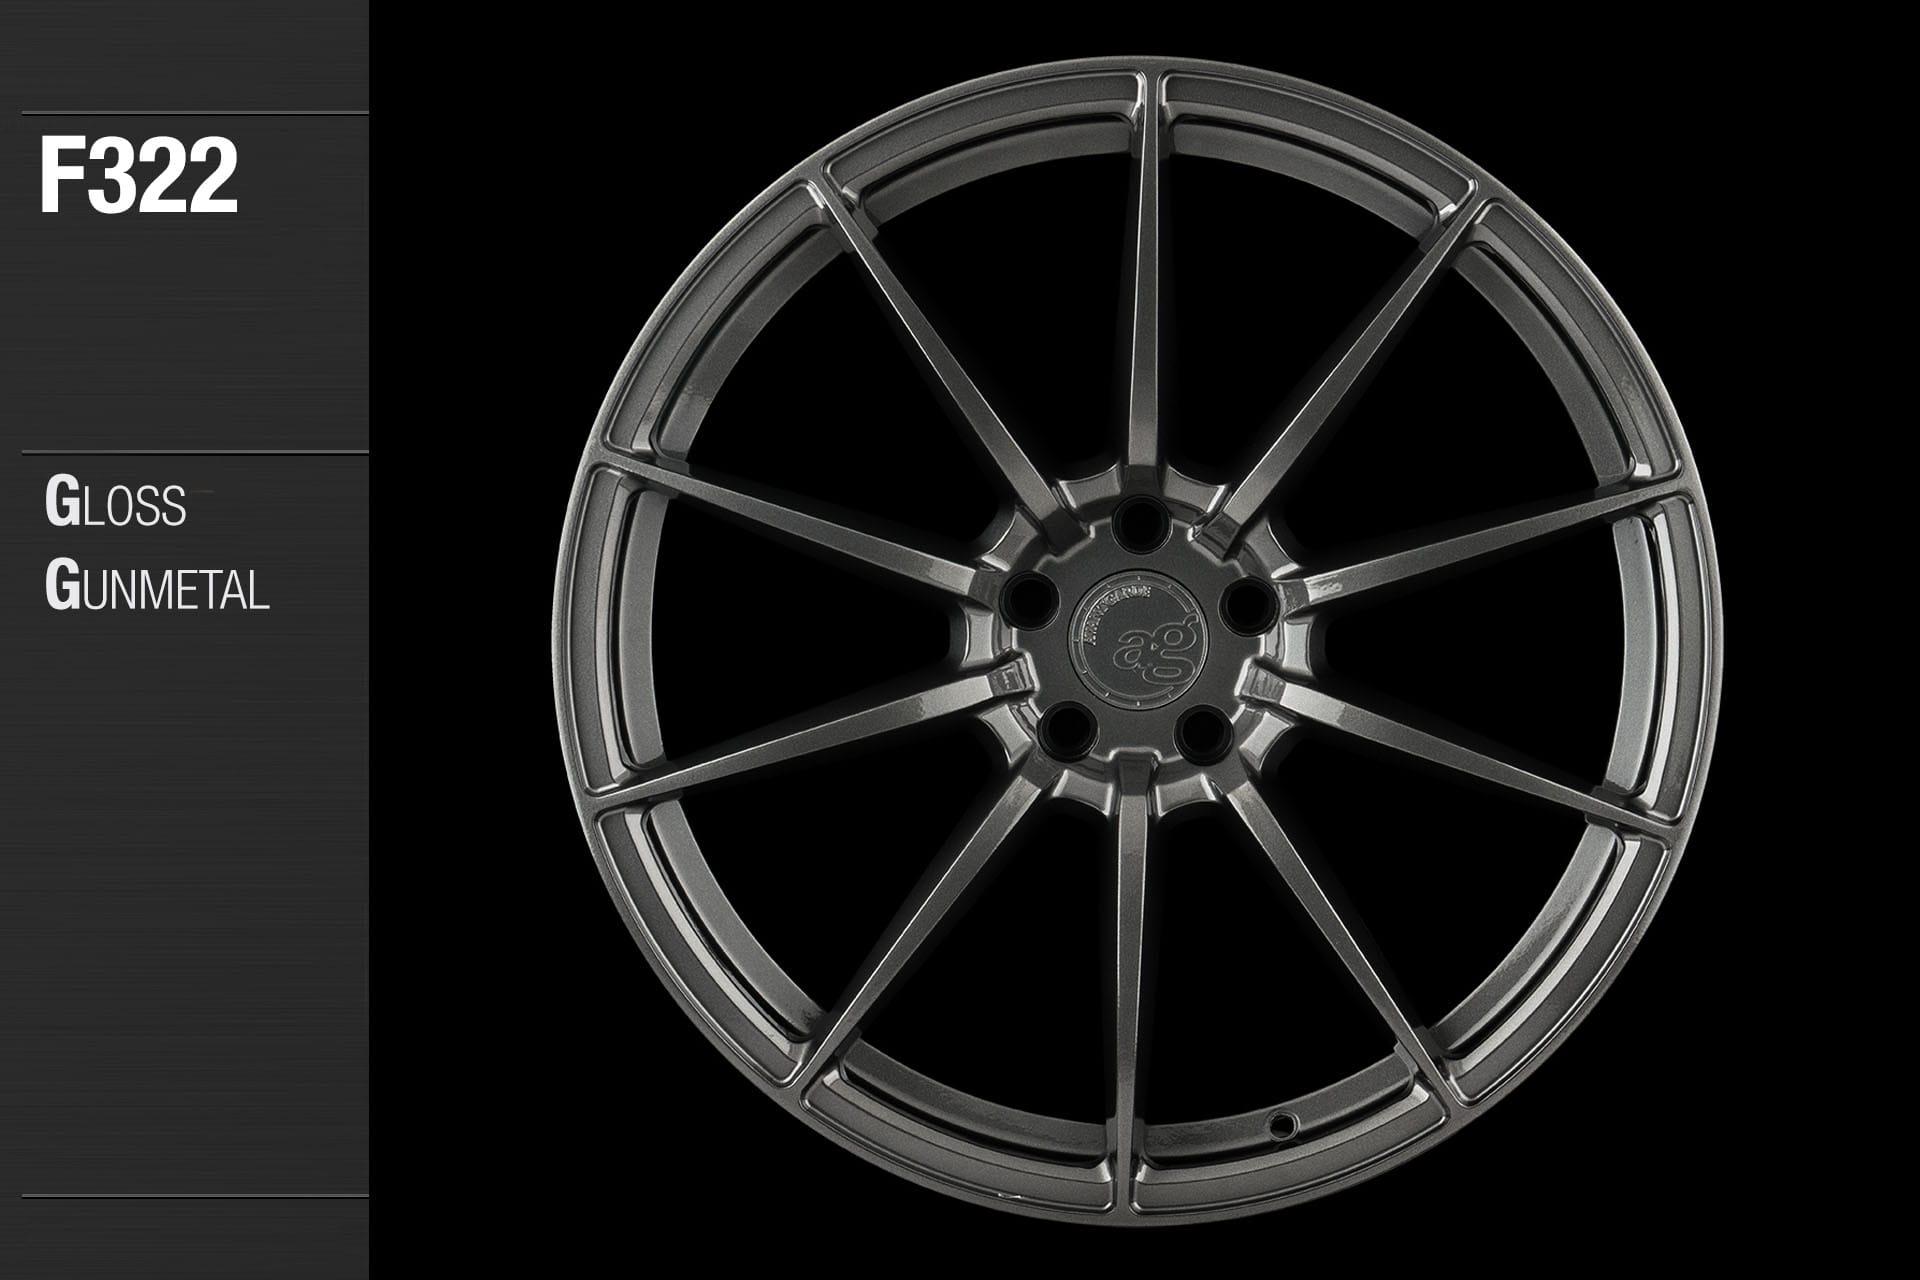 avant-garde-ag-wheels-f322-gloss-gunmetal-1-min